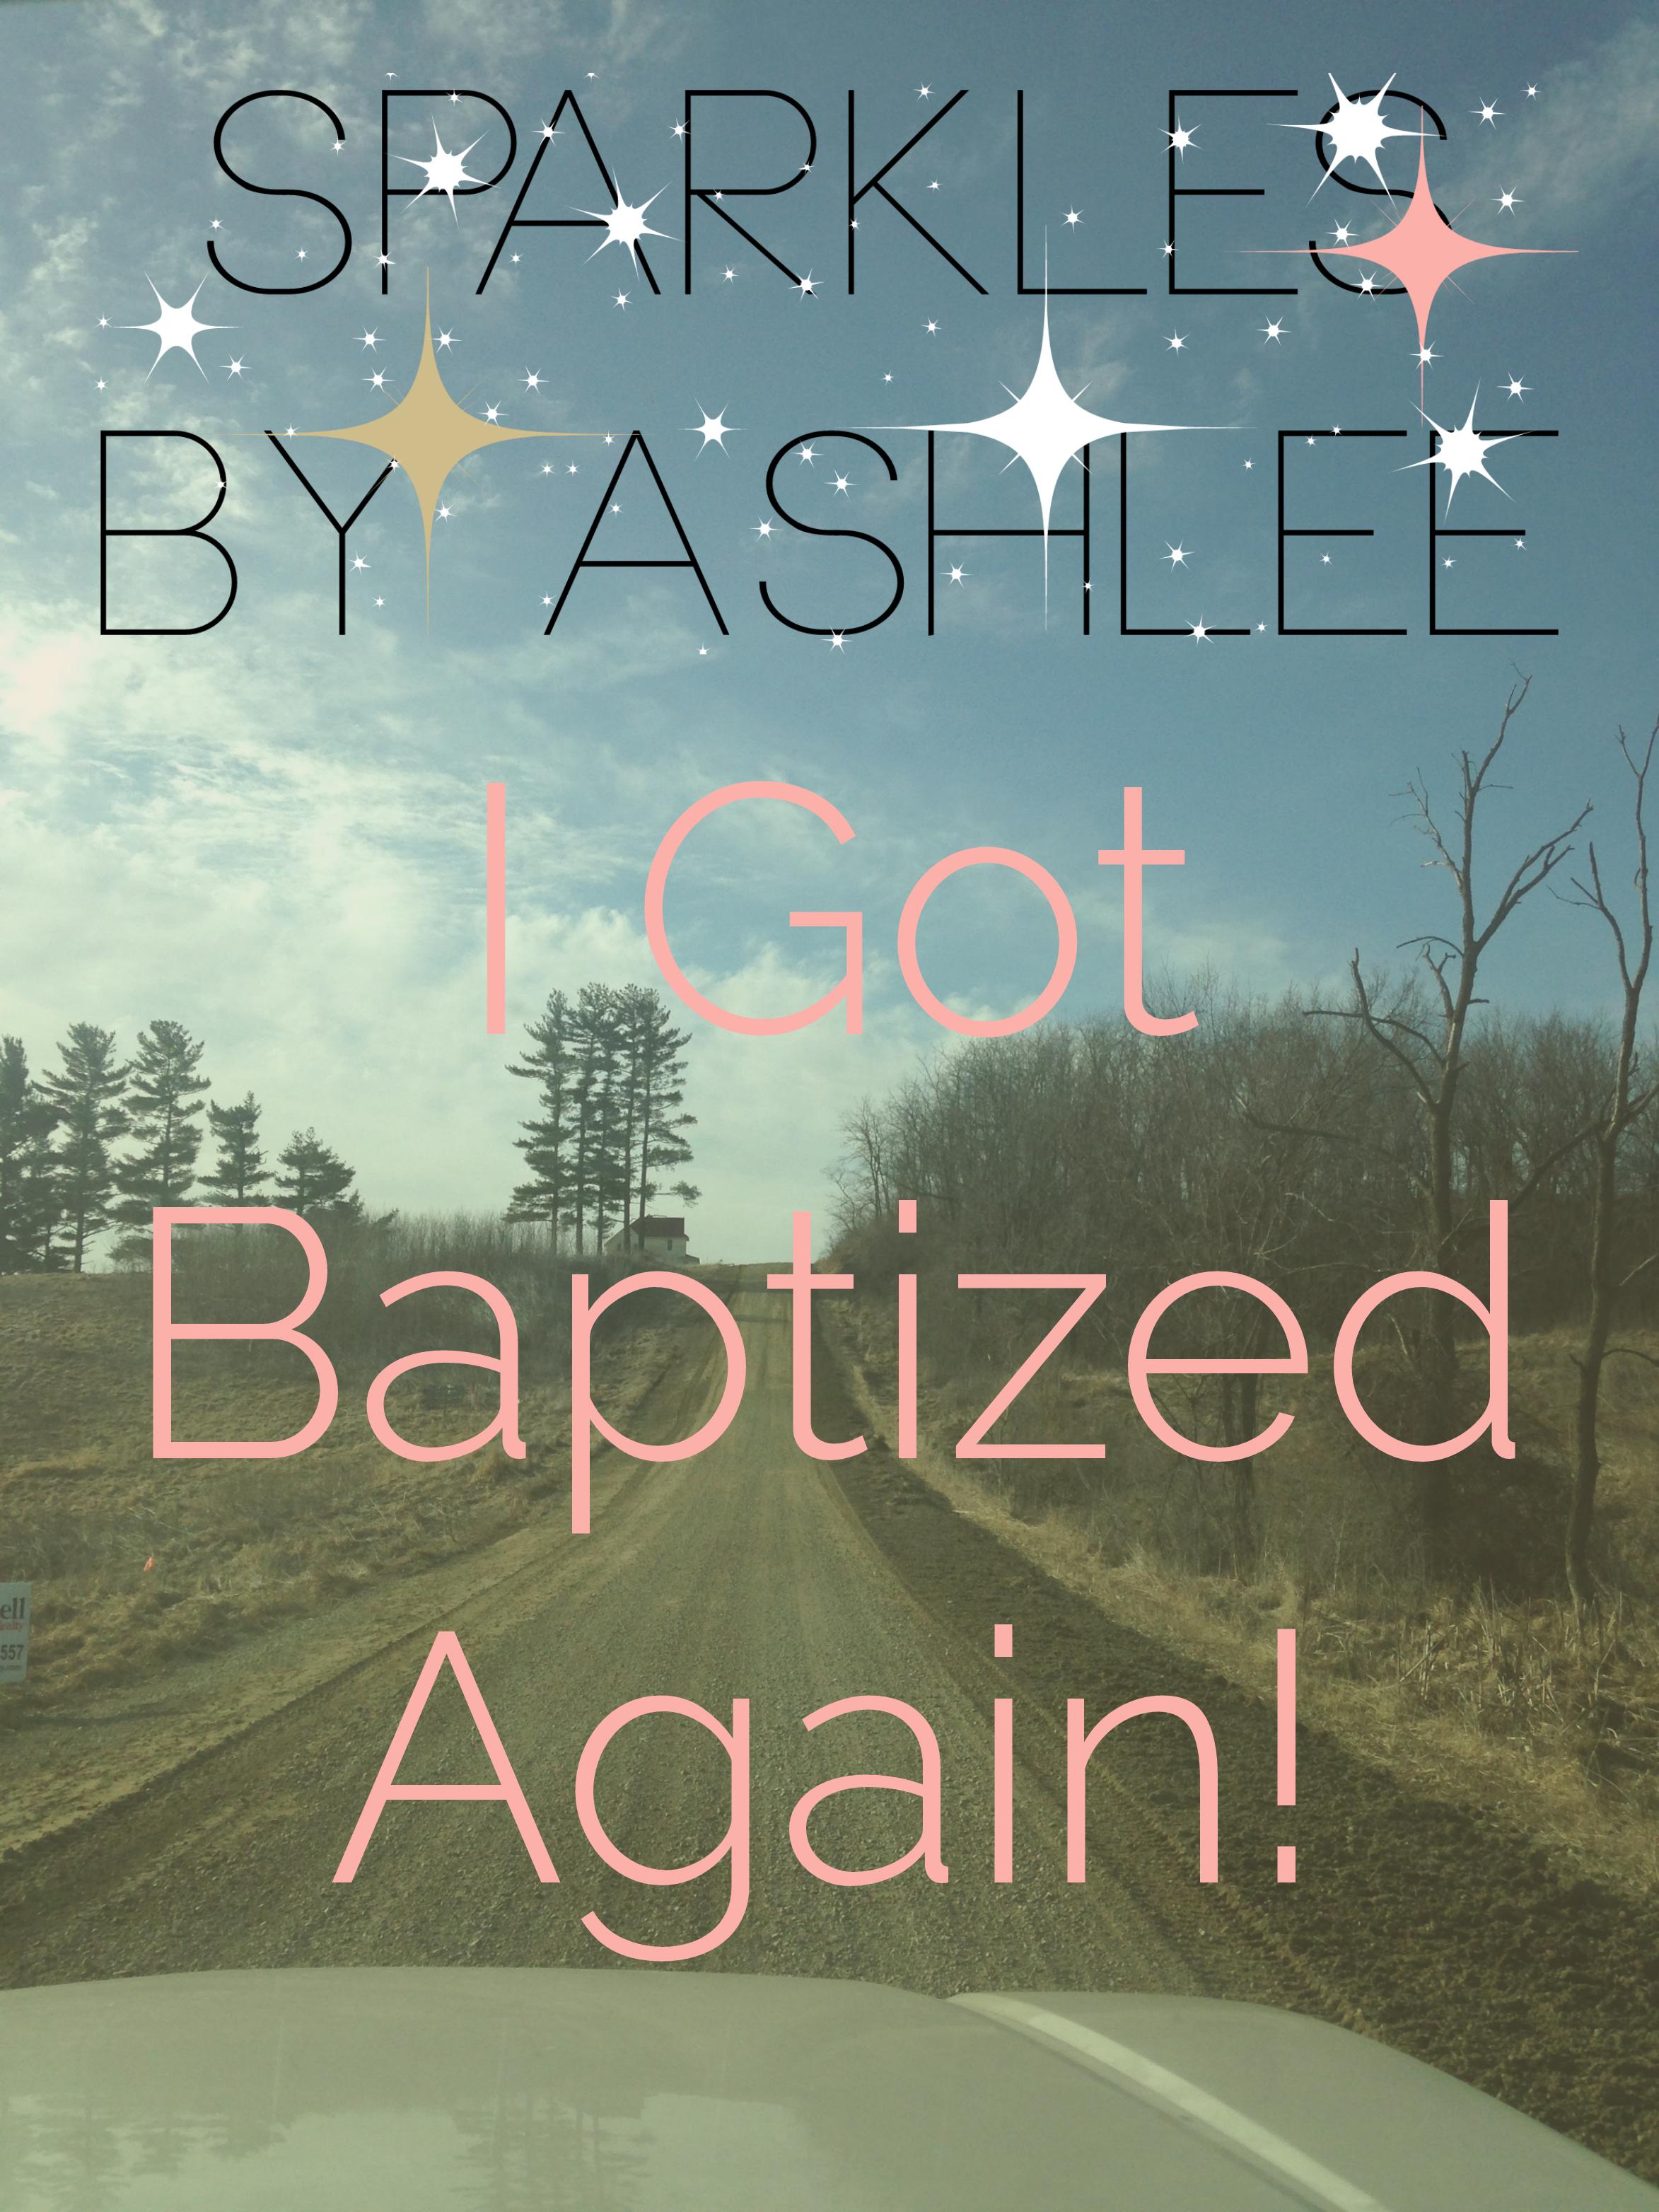 I-Got-Baptized-Again-Sparkles-by-Ashlee.jpg